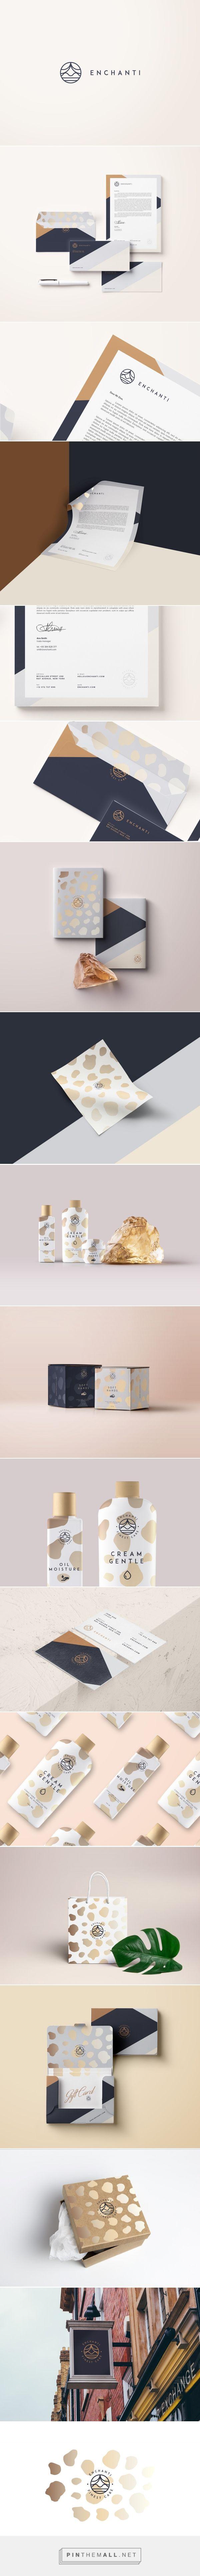 Enchanti Finest Care Cosmetic Branding by Sebastian Bednarek | Fivestar Branding – Design and Branding Agency & Inspiration Gallery